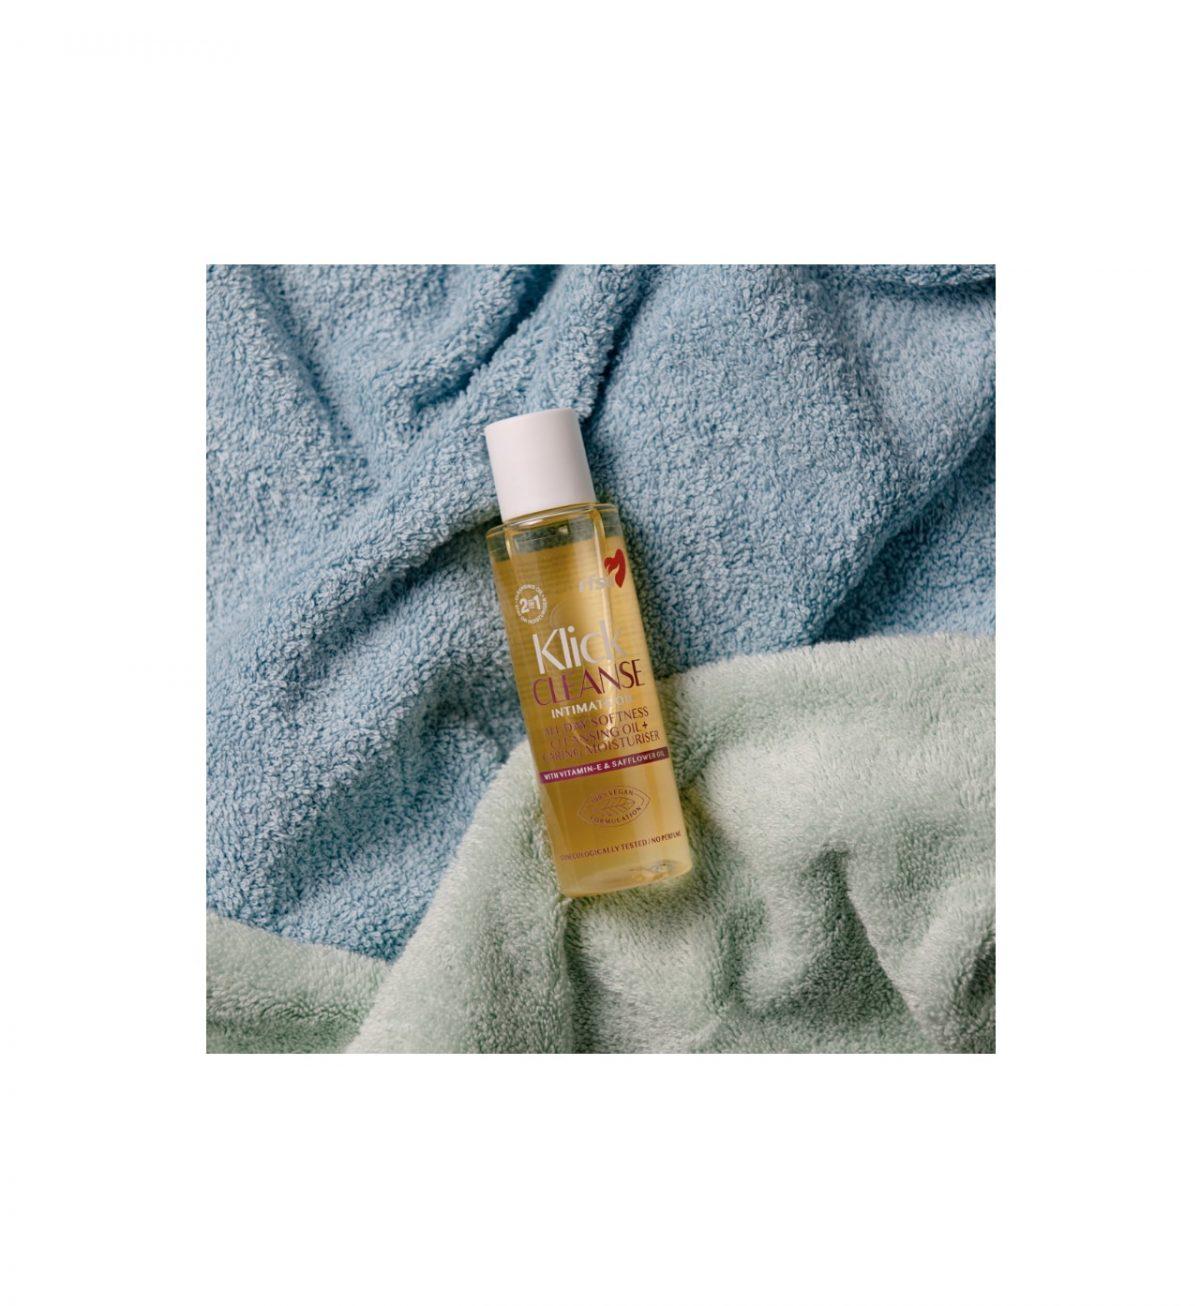 Klick Cleanse Intimate Oil 100 ml - Intimvask + pleiende olje i samme produkt - RFSU